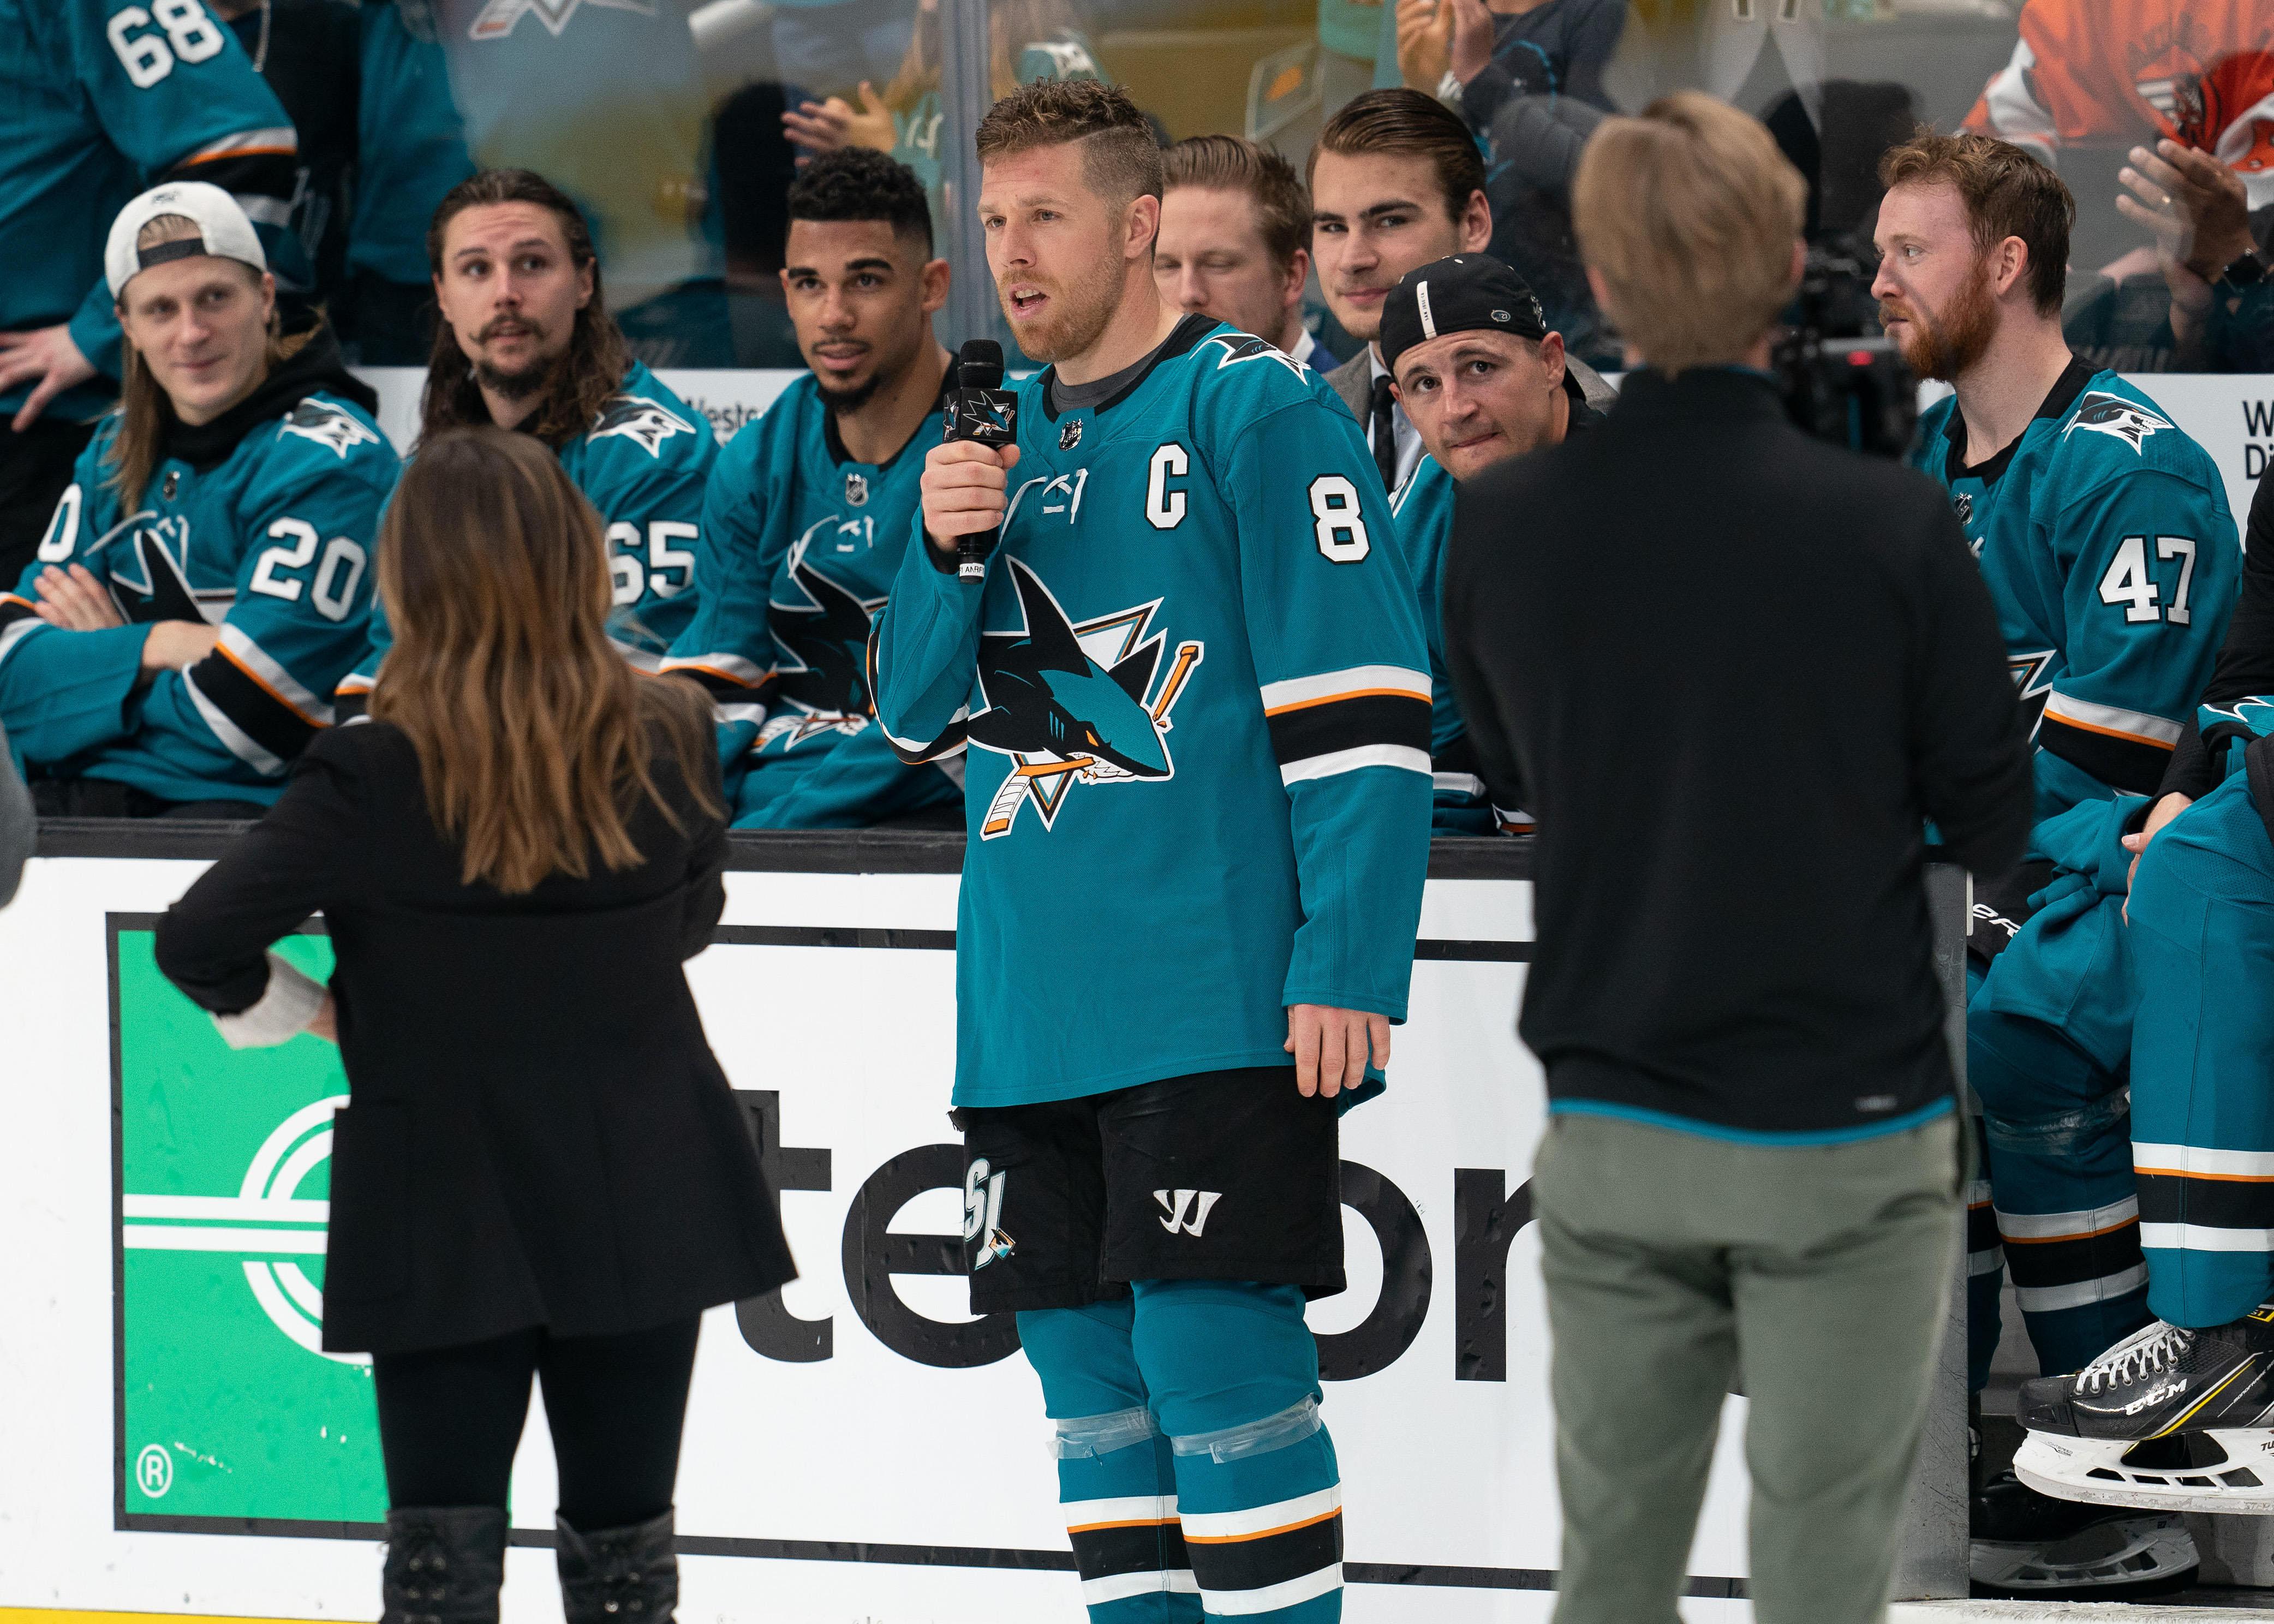 San Jose Sharks center Joe Pavelski (8) addresses fans after a game against the Colorado Avalanche at SAP Center at San Jose.